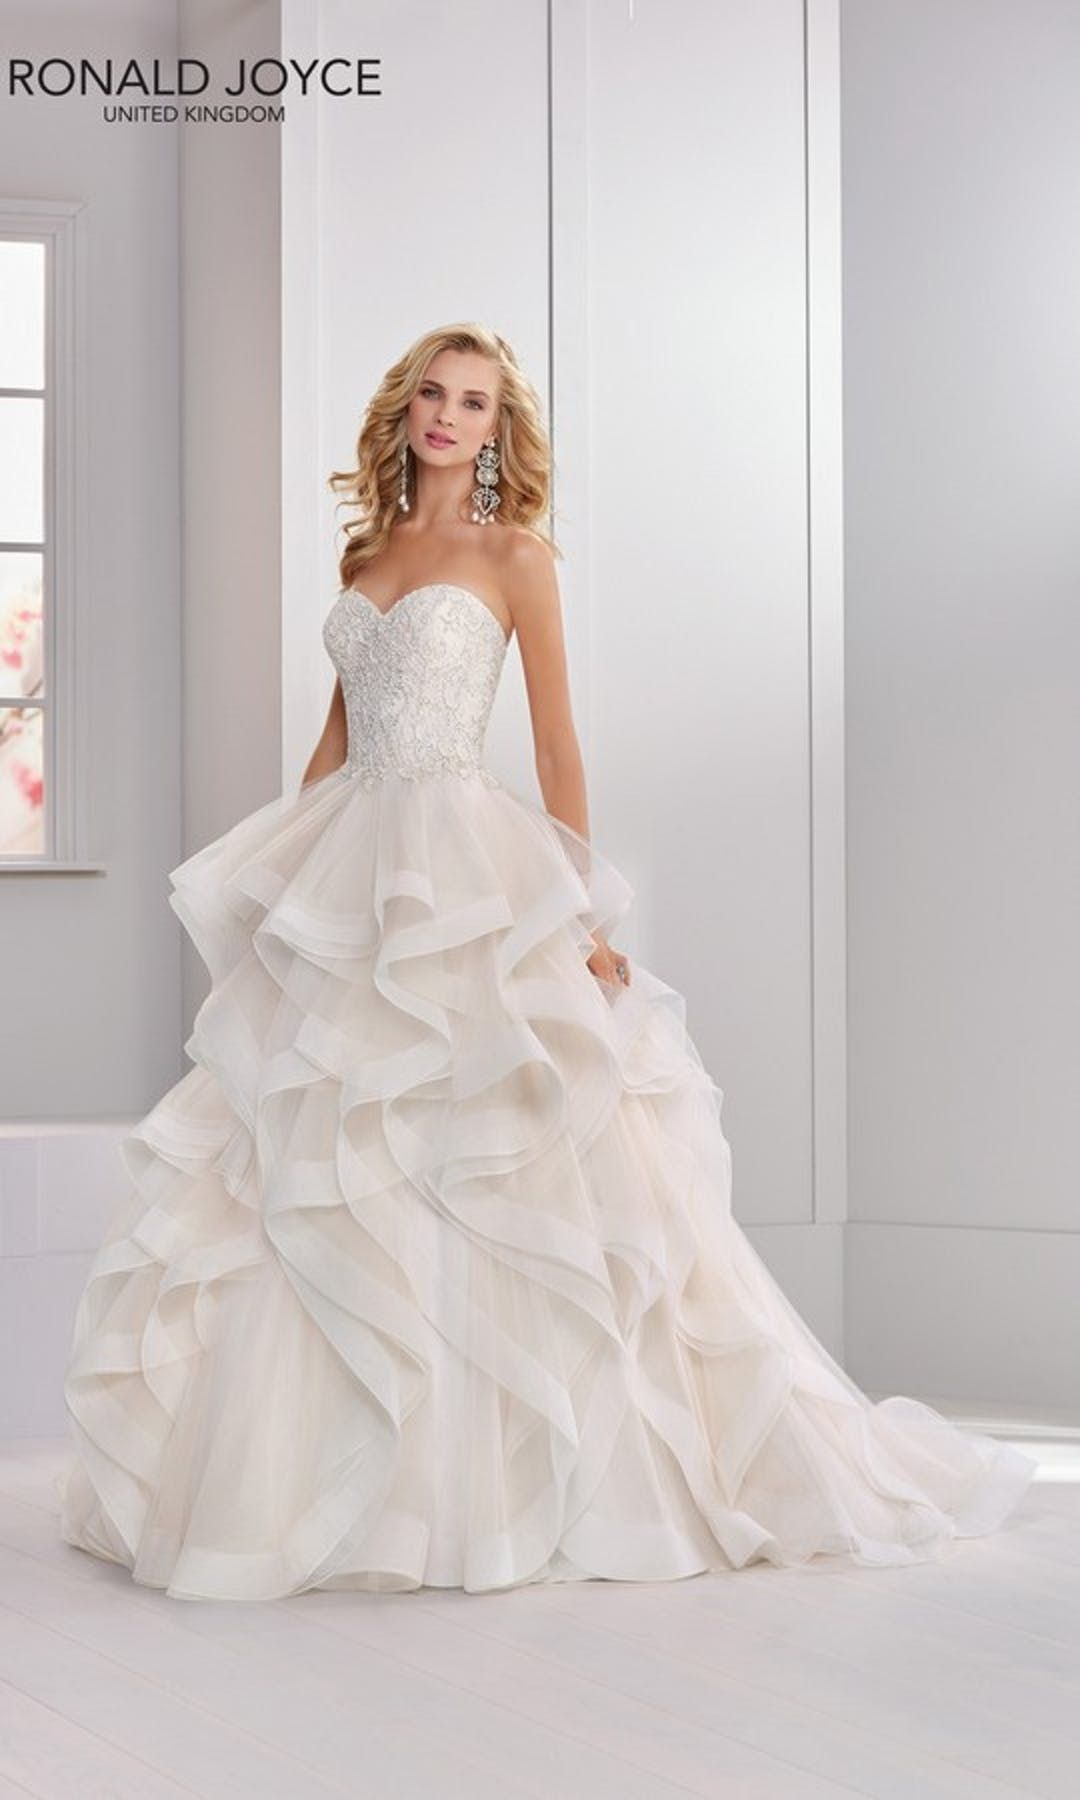 Nellie Wedding Dress 69304 Wedding Dress Ronald Joyce 2018 Collection Confetti Co Uk Ruffle Wedding Dress Ronald Joyce Wedding Dresses Wedding Dresses [ 1800 x 1080 Pixel ]